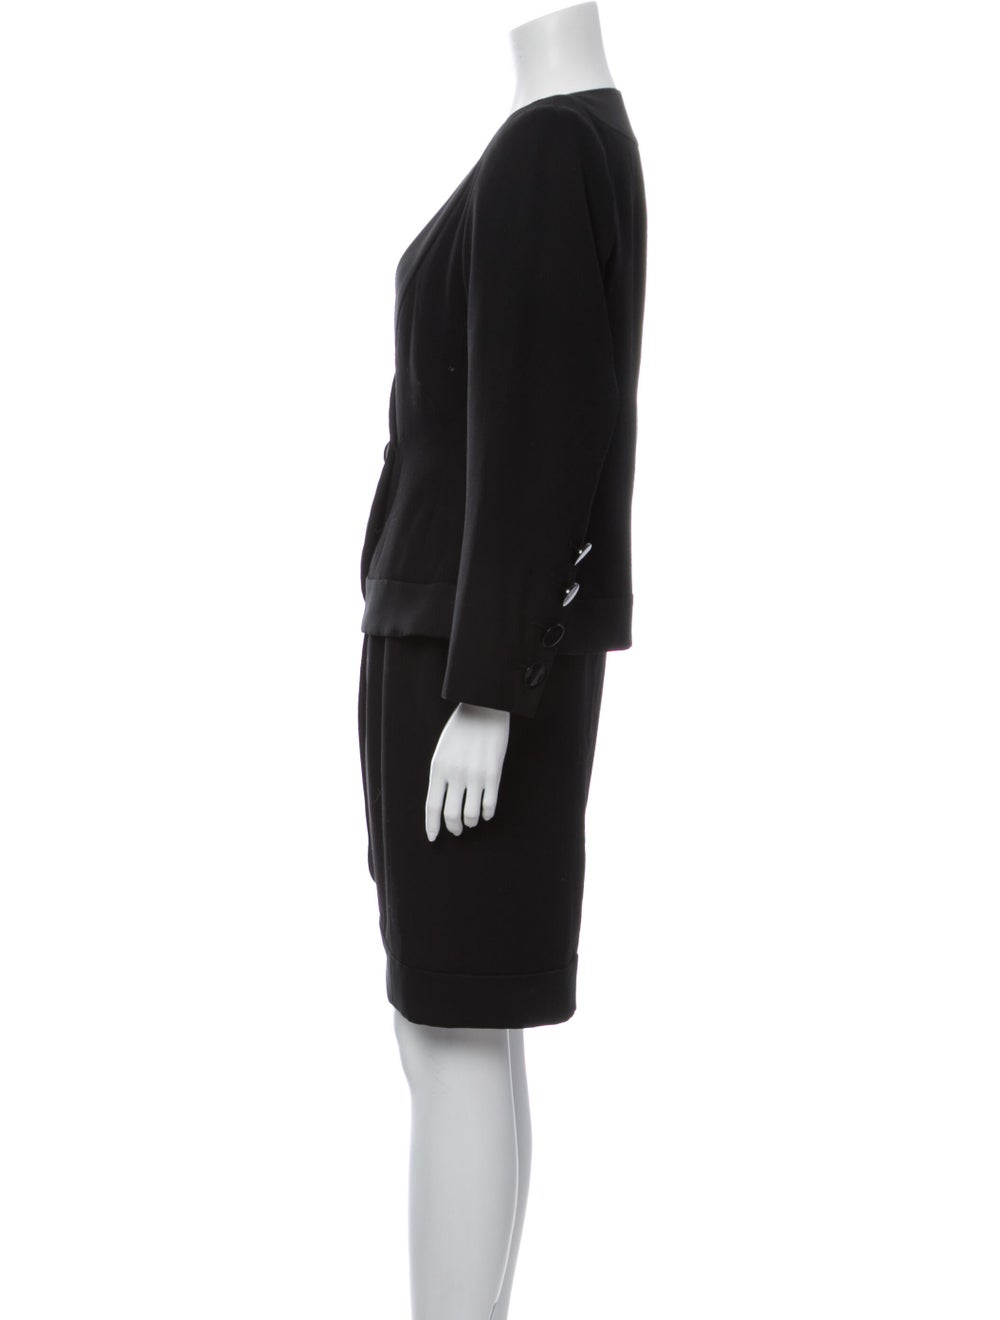 Yves Saint Laurent Vintage Skirt Suit Black - image 2